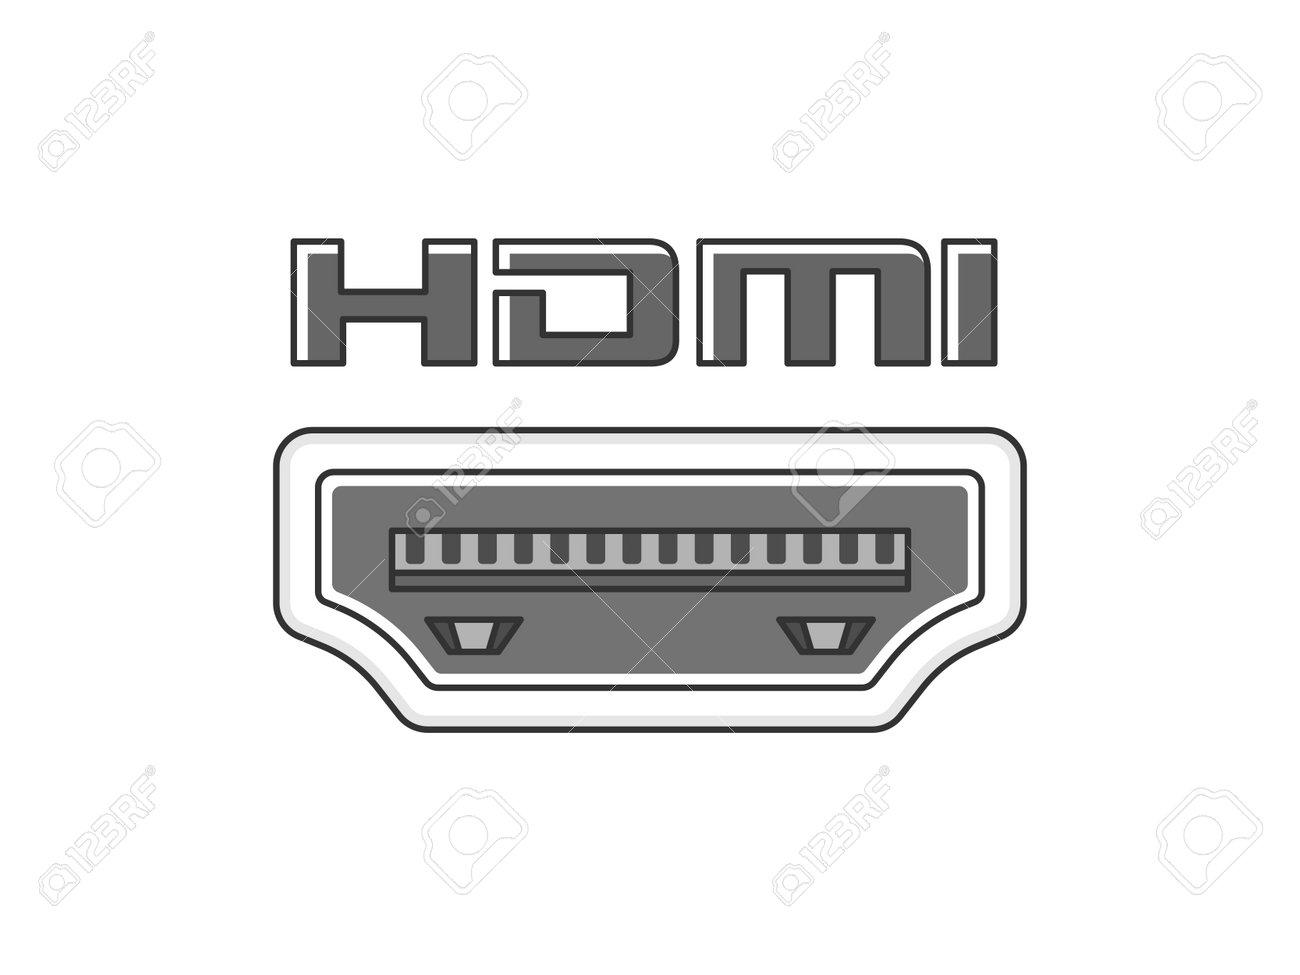 HDMI terminal illustration - 163697115